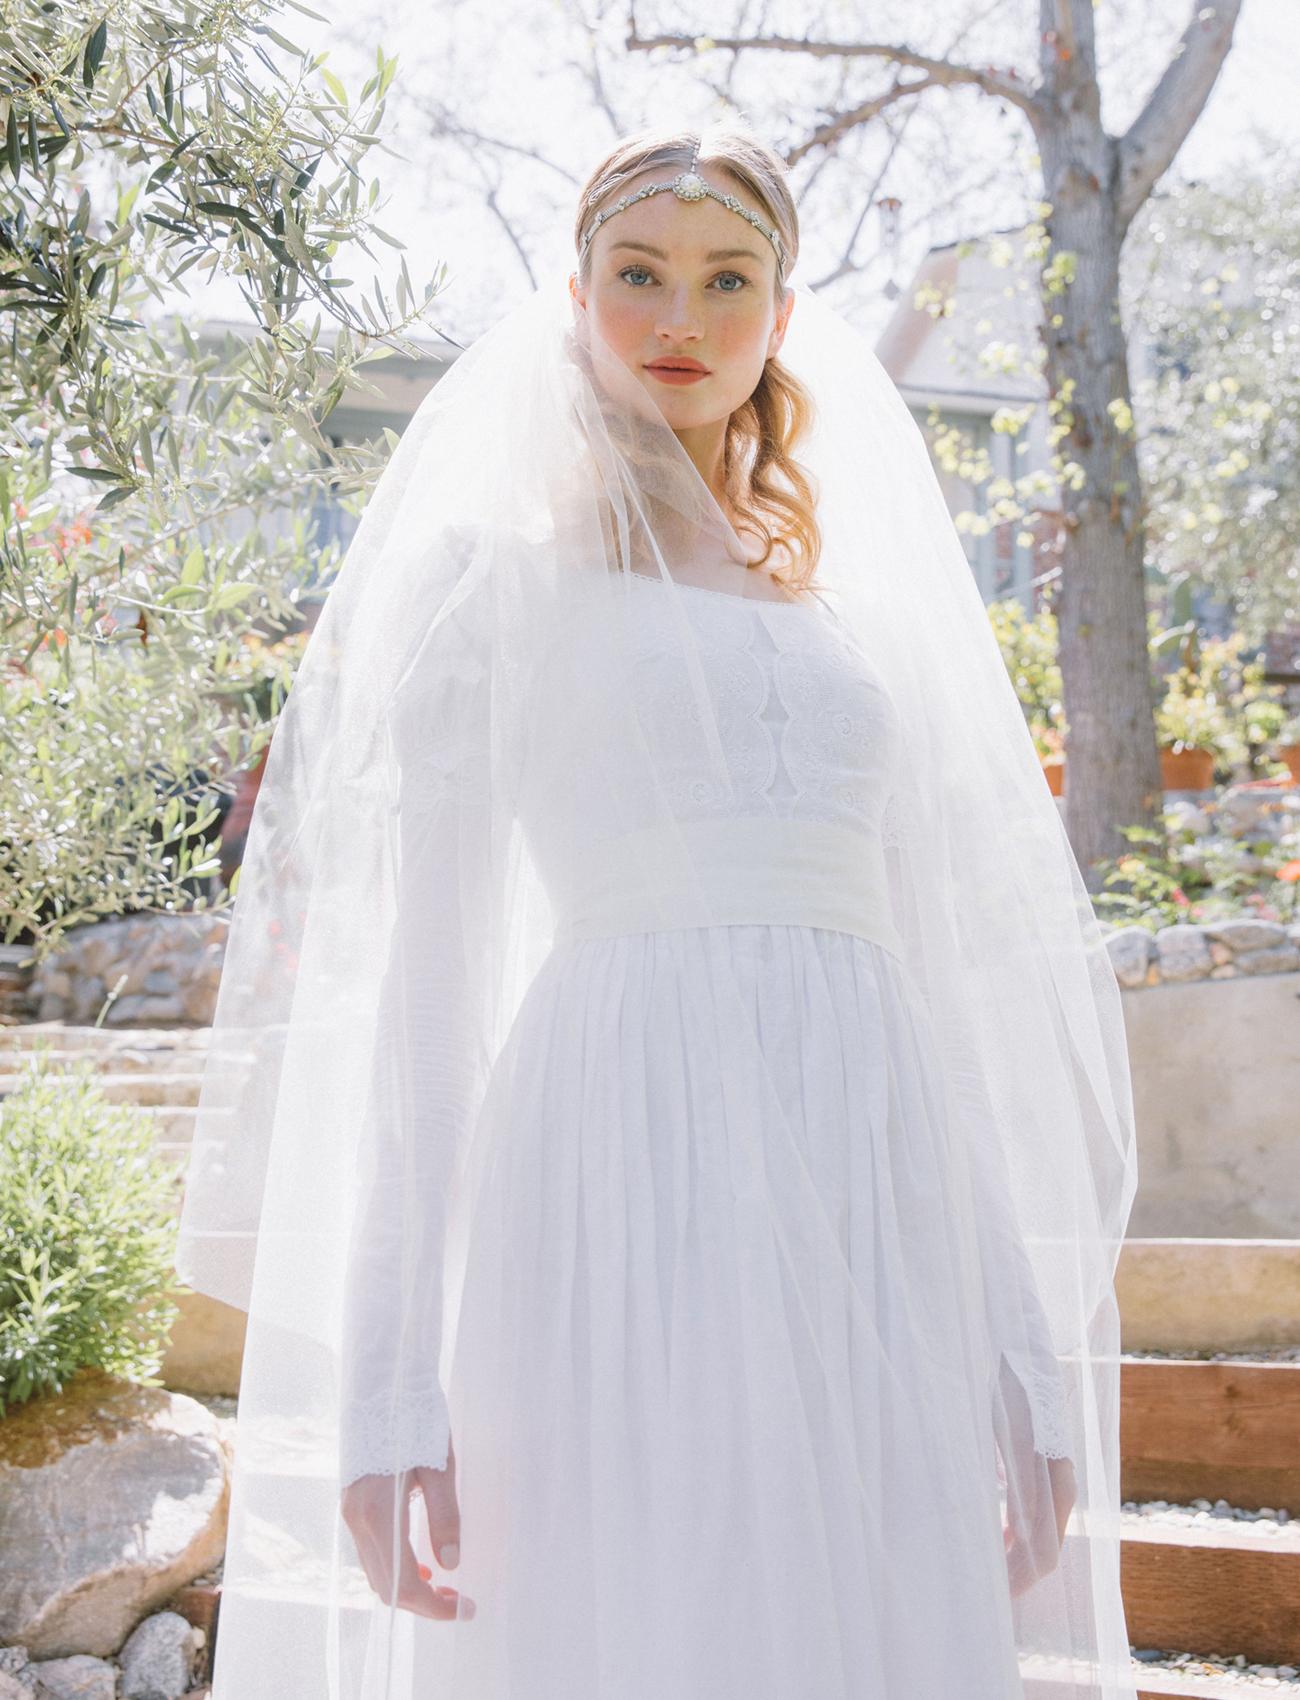 219562e3c4da Green Wedding Shoes on Feedspot - Rss Feed